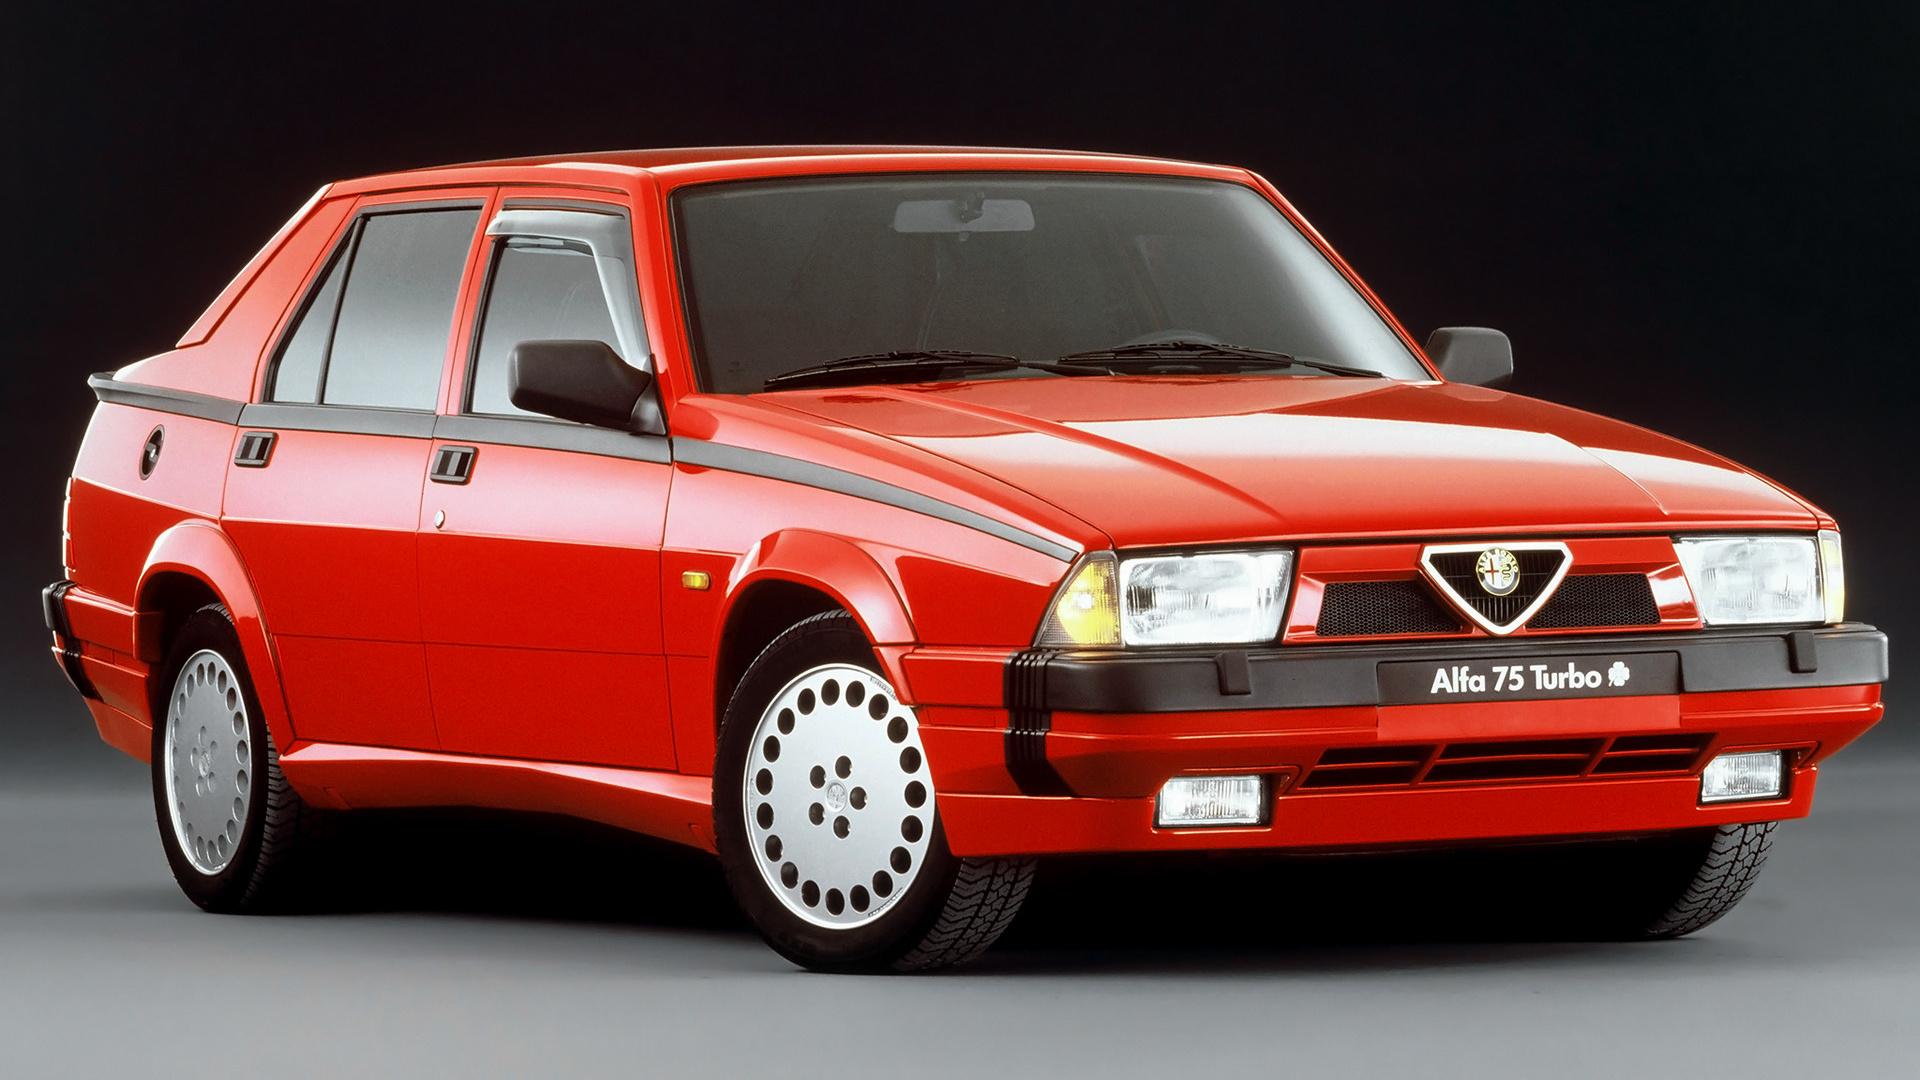 1988 Alfa Romeo 75 Quadrifoglio Verde Wallpapers And Hd Images Car Pixel